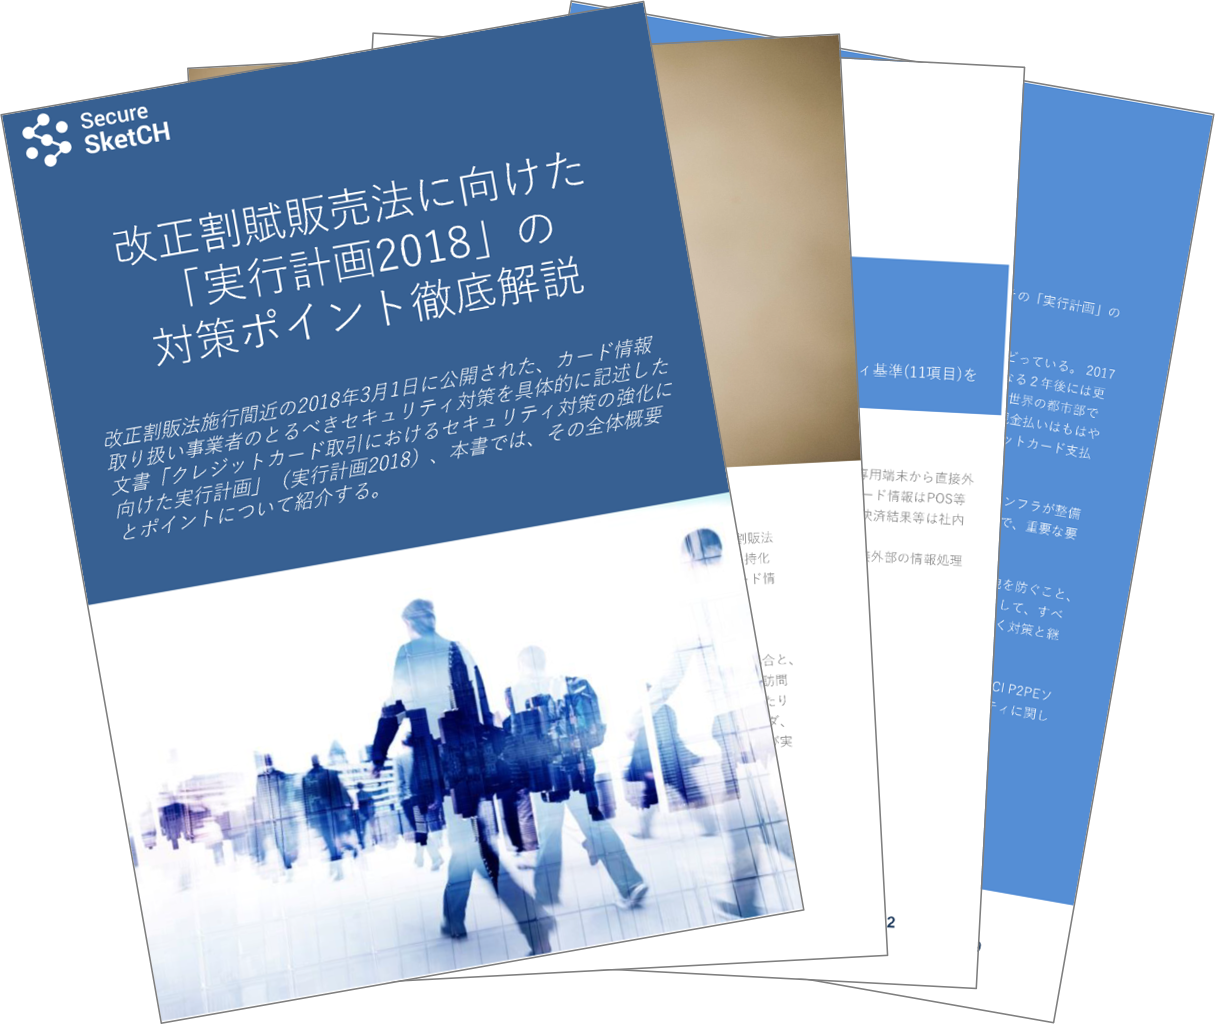 download_Secure_SketCH_kappu-hanbaihou